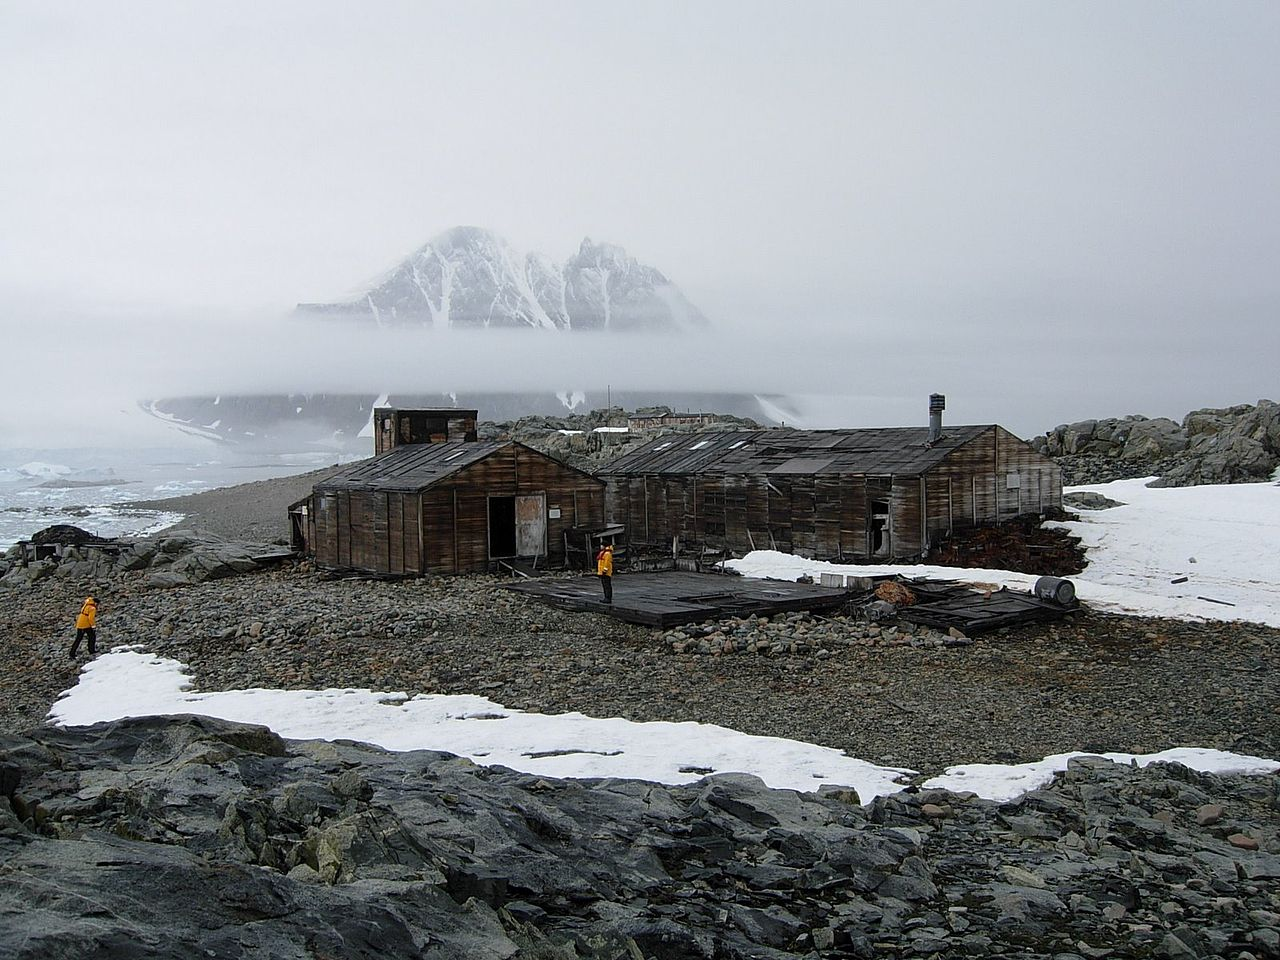 Антарктида: тайны заброшенных станций